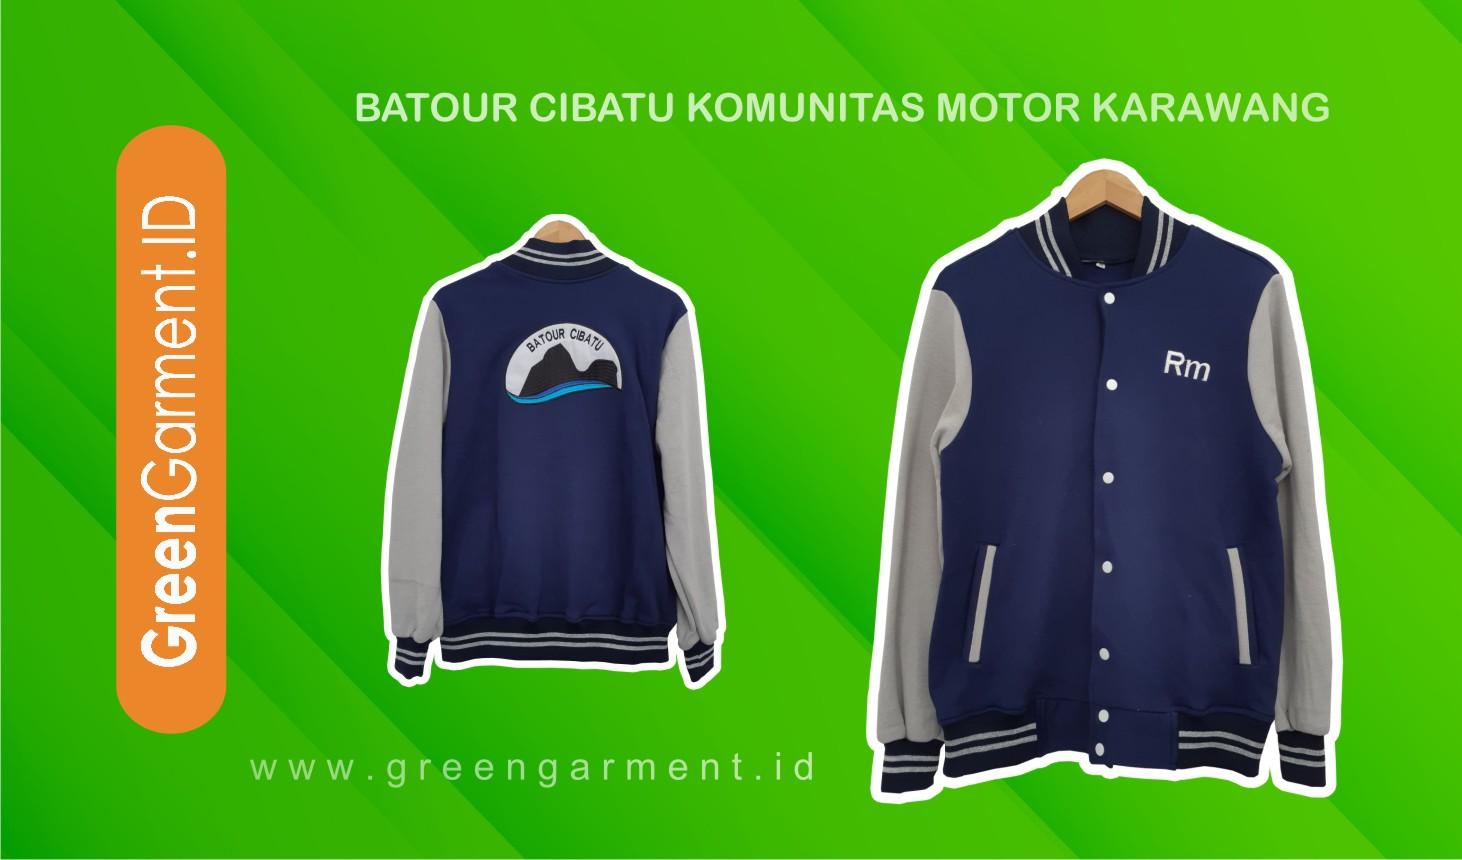 Batour Cibatu Komunitas Motor Karawang Green Garment